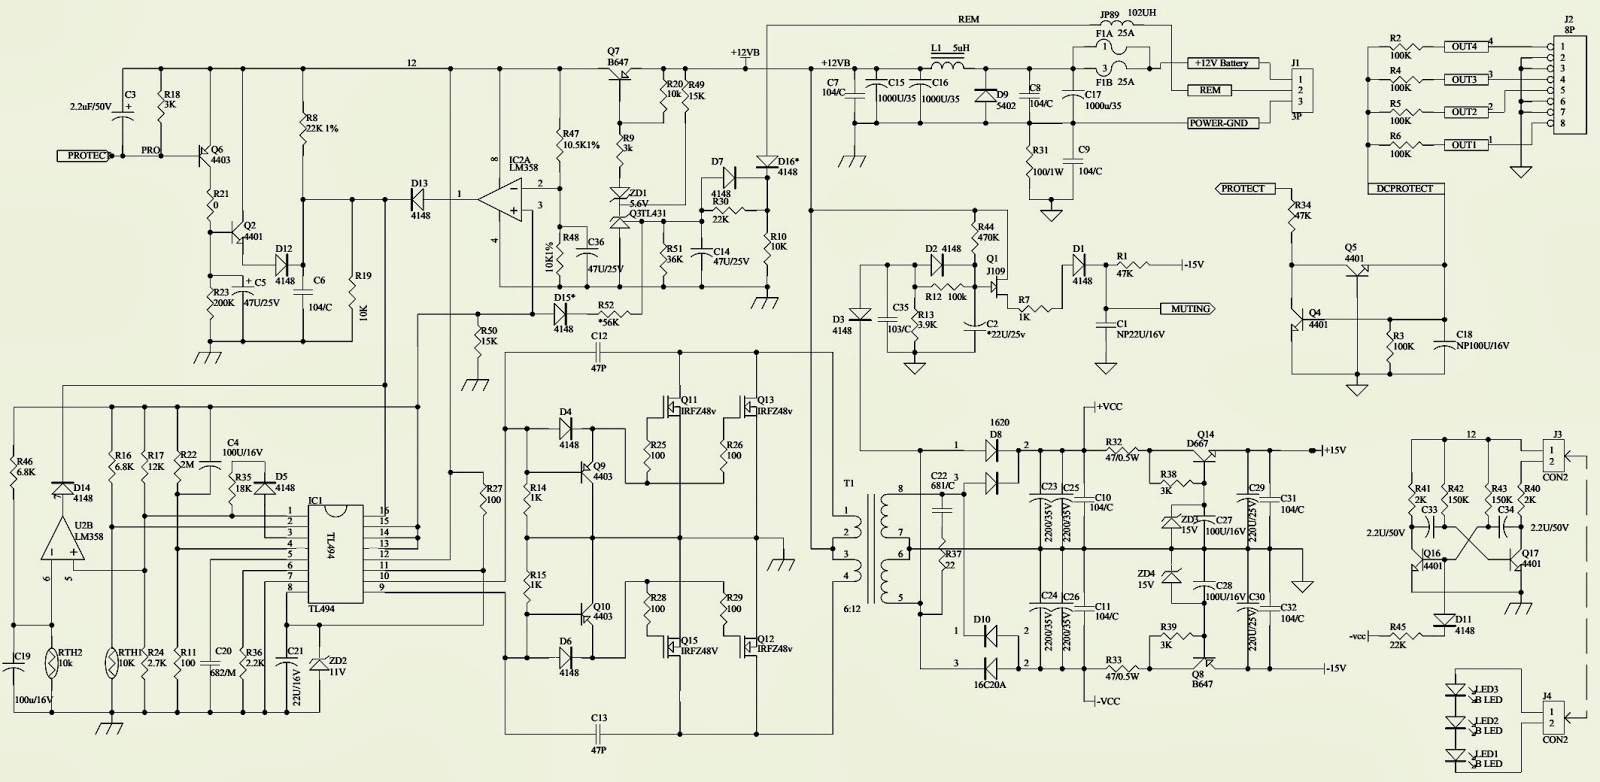 4 Channel Amp Wiring Diagram 2006 Jeep Wrangler Jbl Cs 60 4channel Power Amplifier Schematic